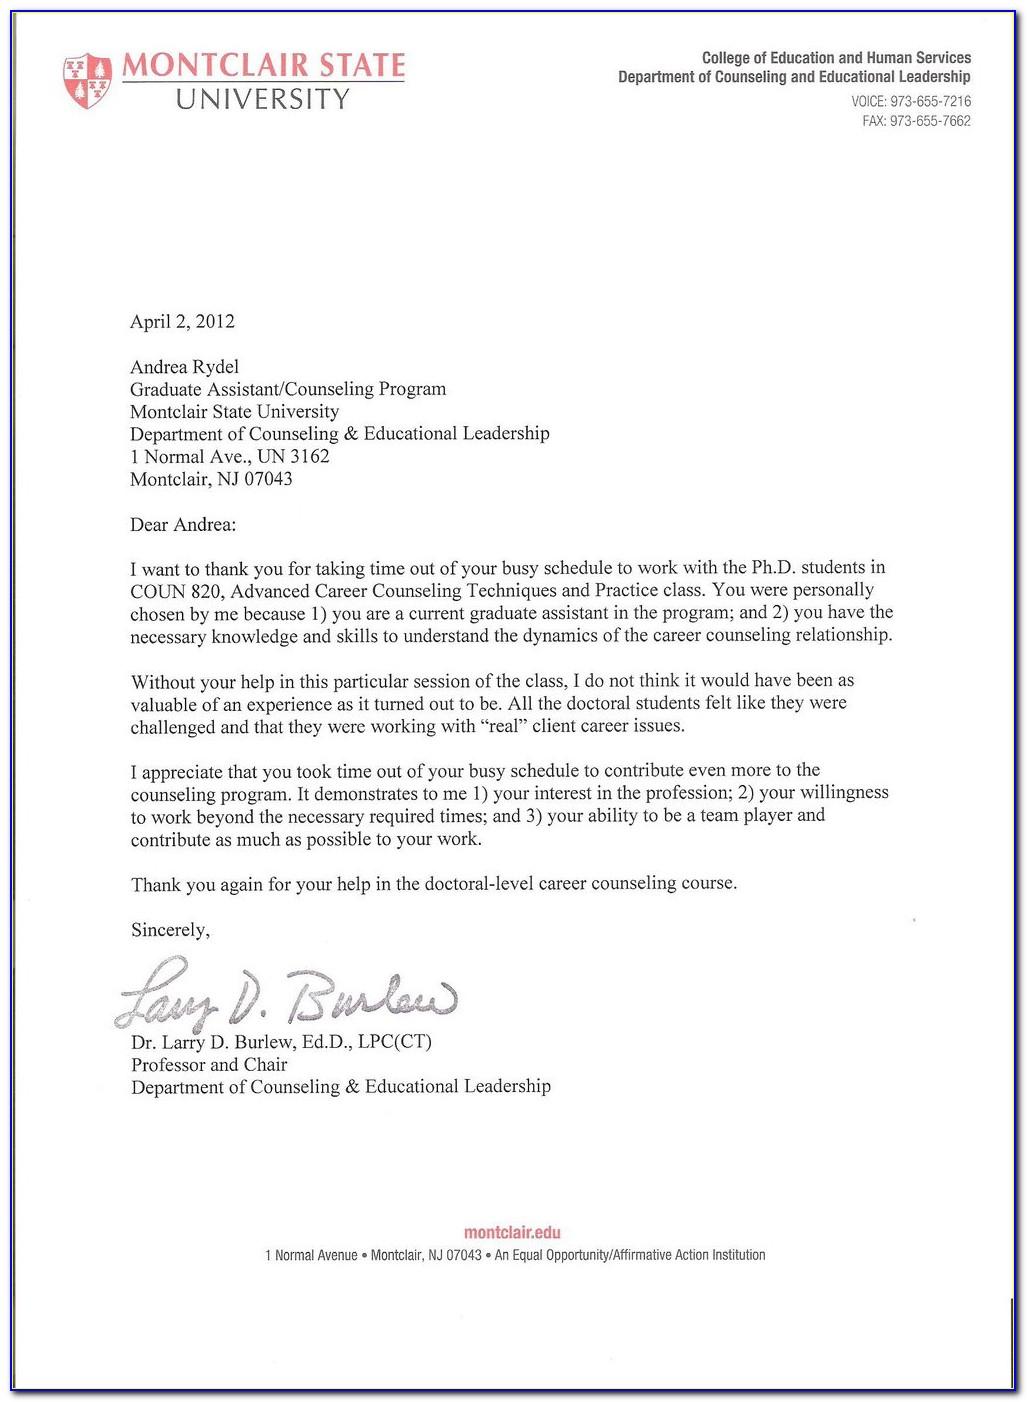 Professional Resume Writers In Bergen County Nj